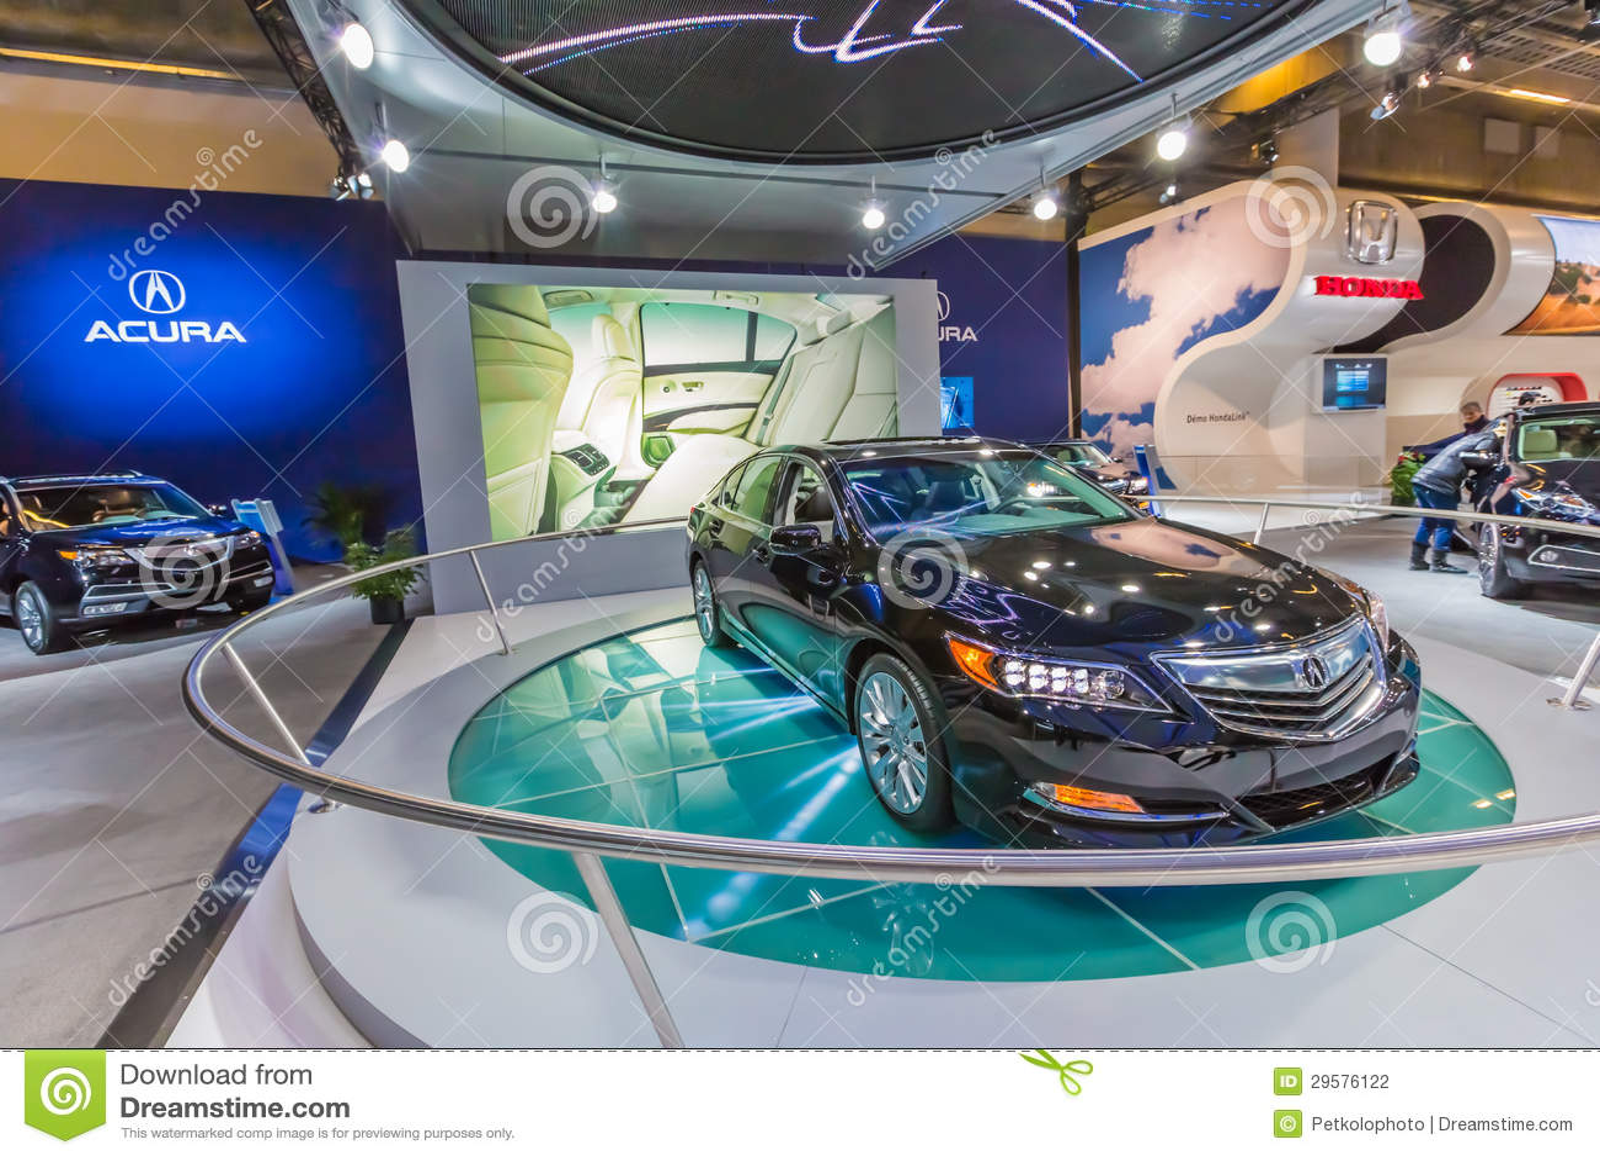 Acura 2013 RLX